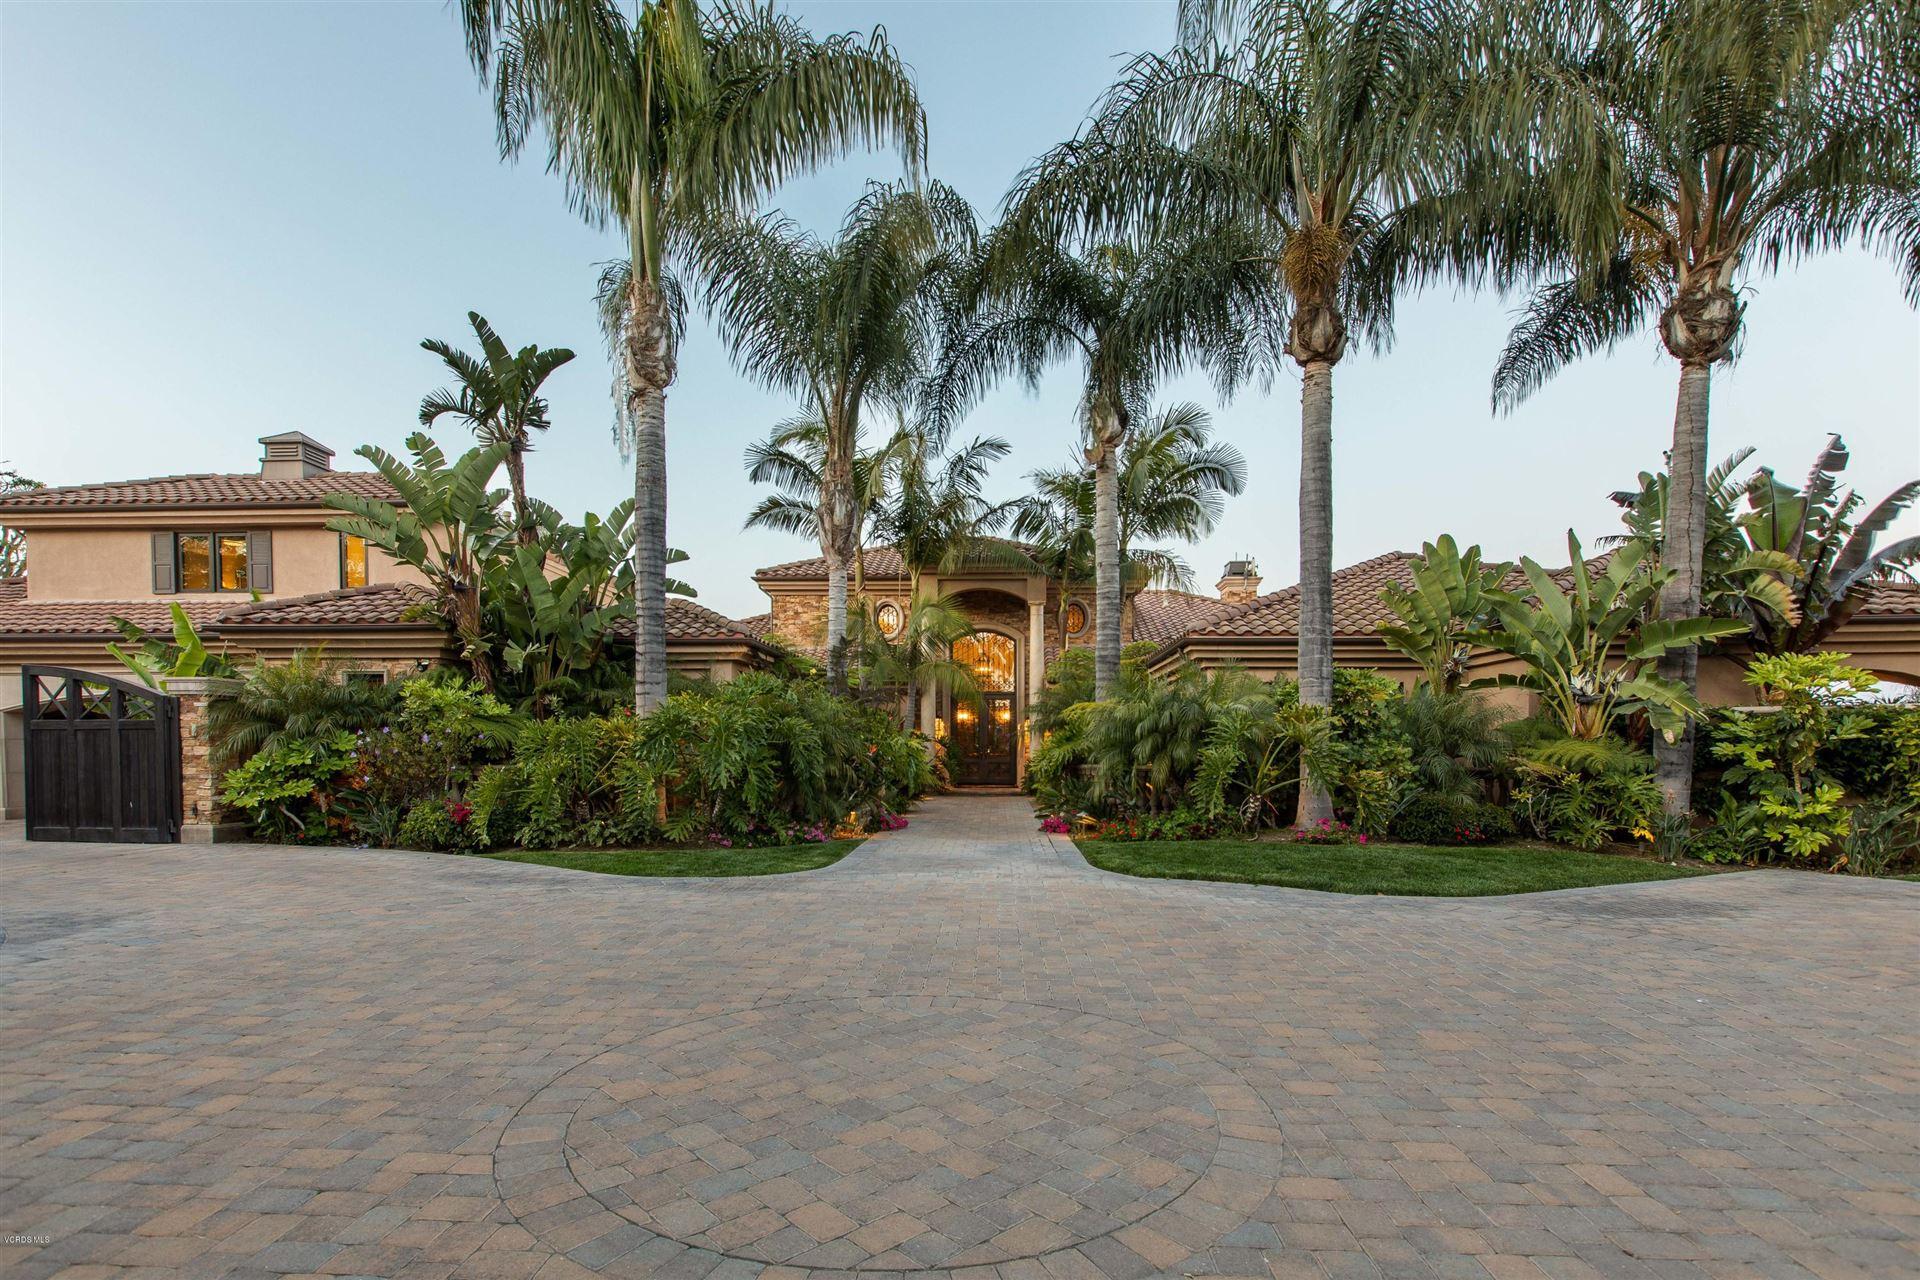 13723 Nightsky Drive, Camarillo, CA 93012 - MLS#: 219006563